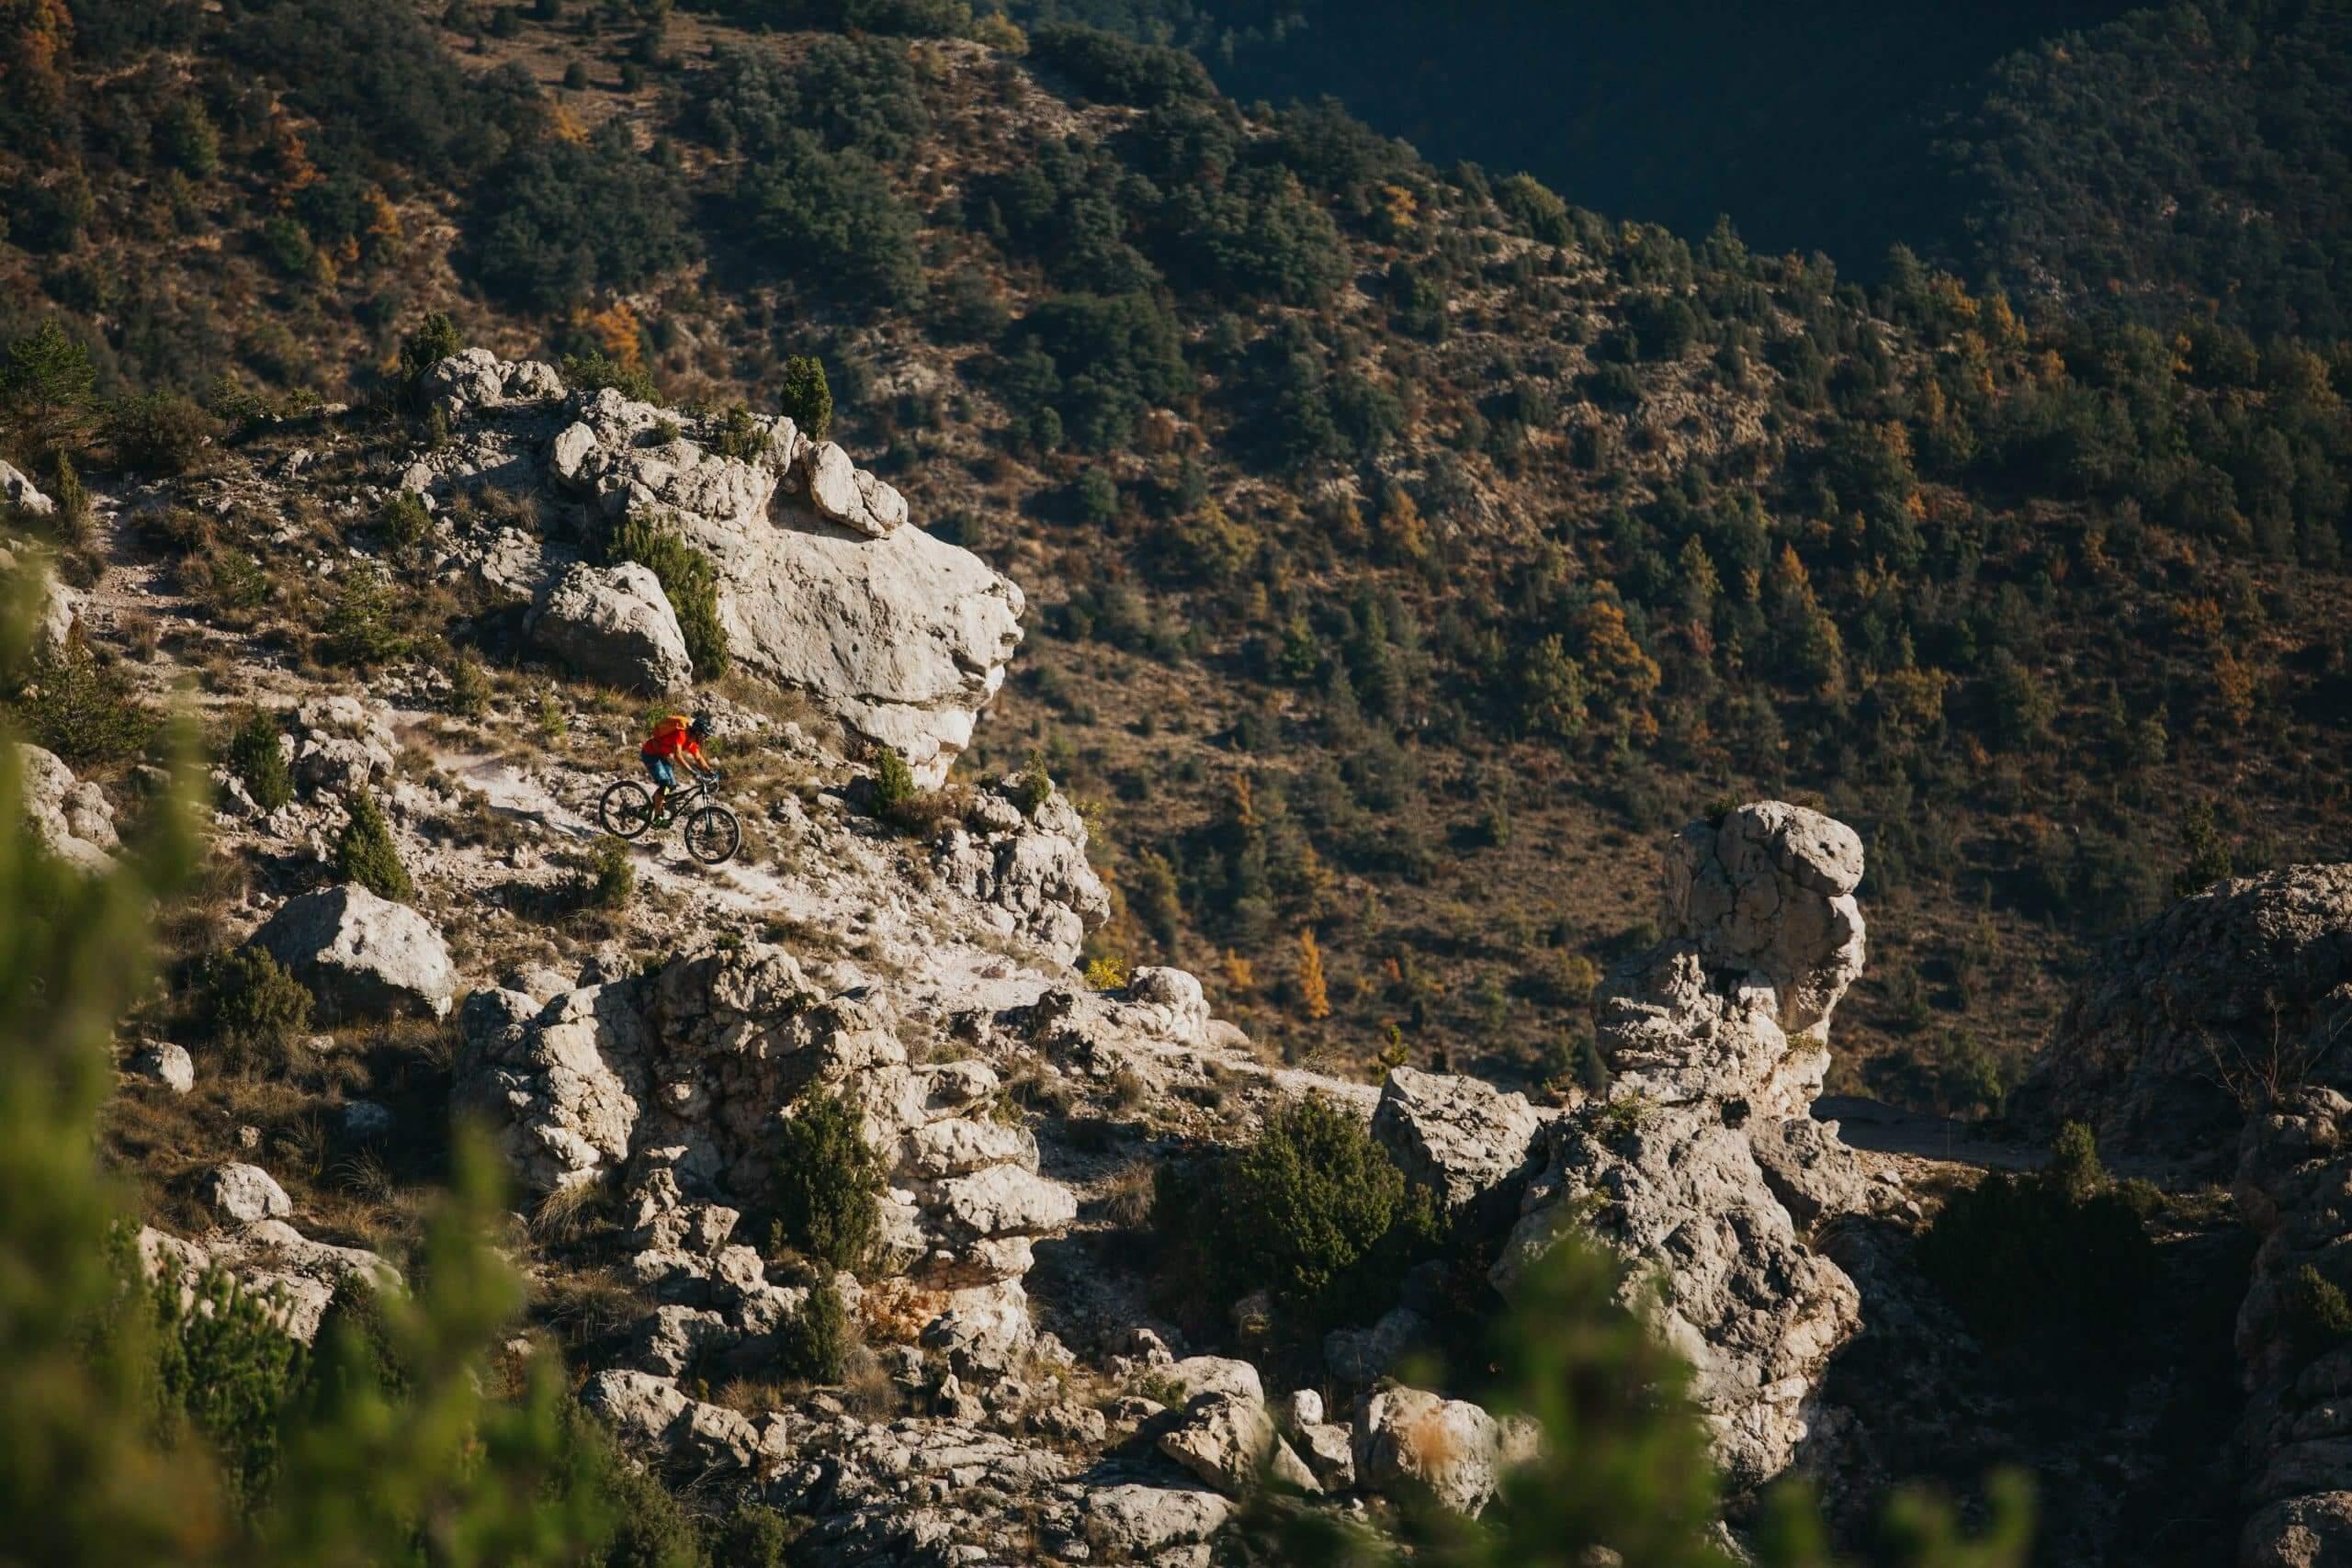 pyrenees-orientales-altitude-adventures-mtb-outsideisfree-Adrien-Ridge